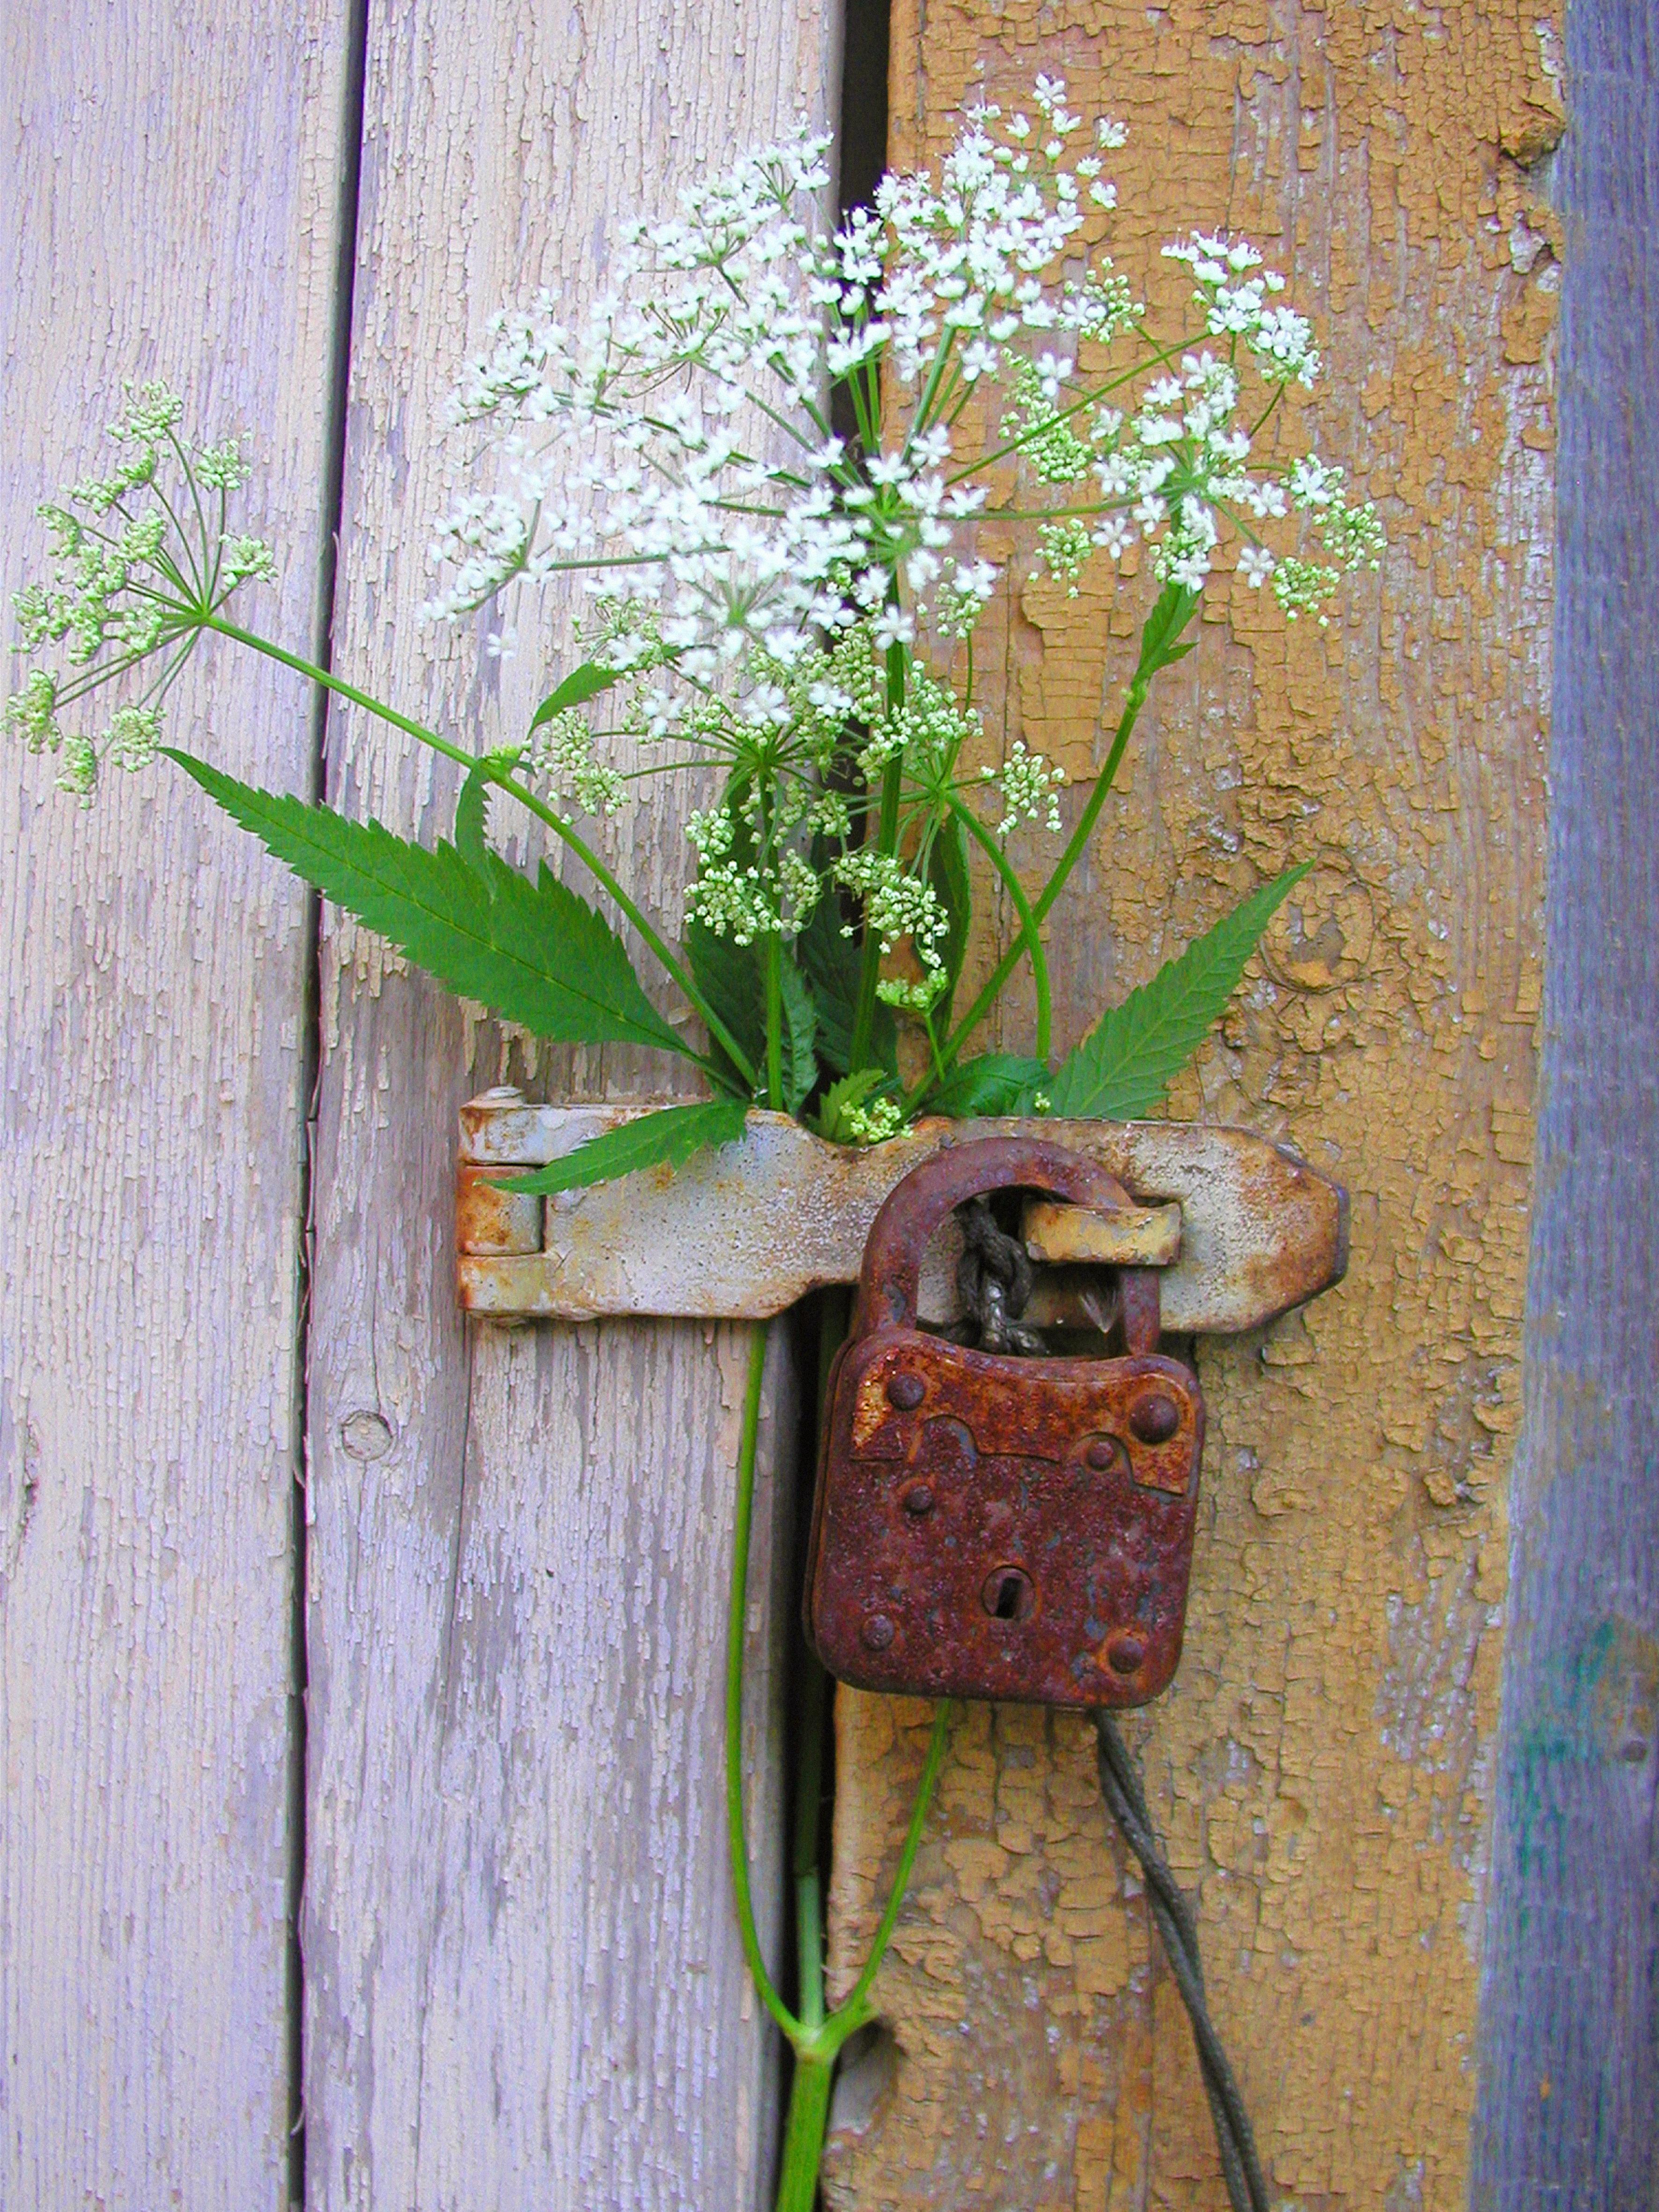 free images : plant, leaf, wall, green, castle, botany, flora